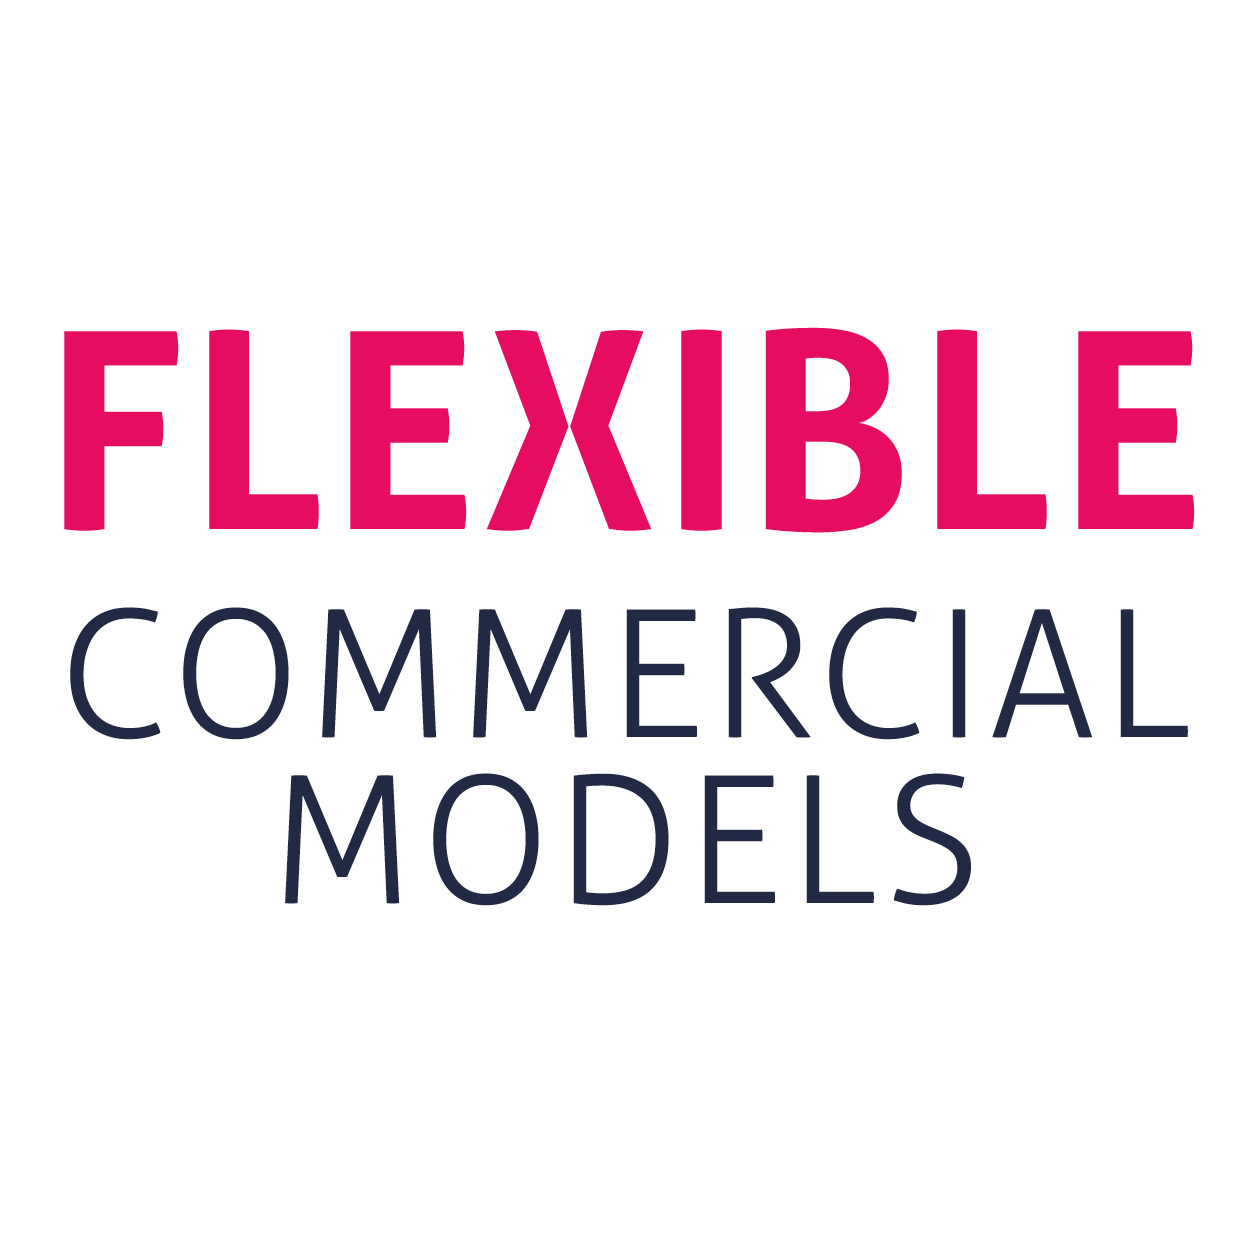 Flexible commercial models